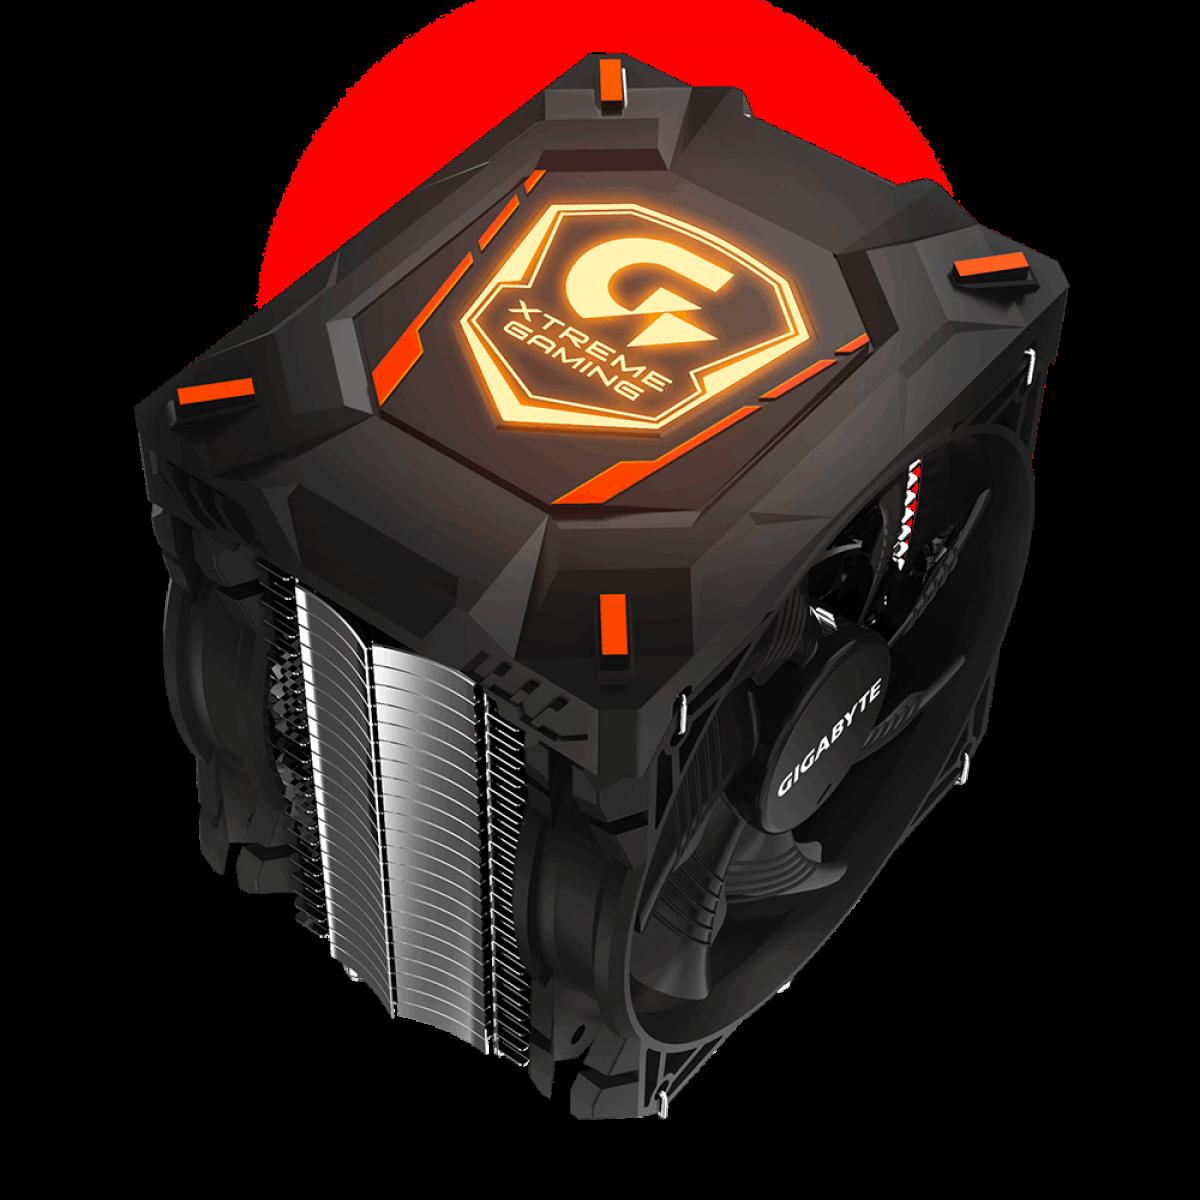 Cooler para Processador Gigabyte Xtreme Gaming XTC700, RGB 120mm, Intel-AMD, GP-XTC700